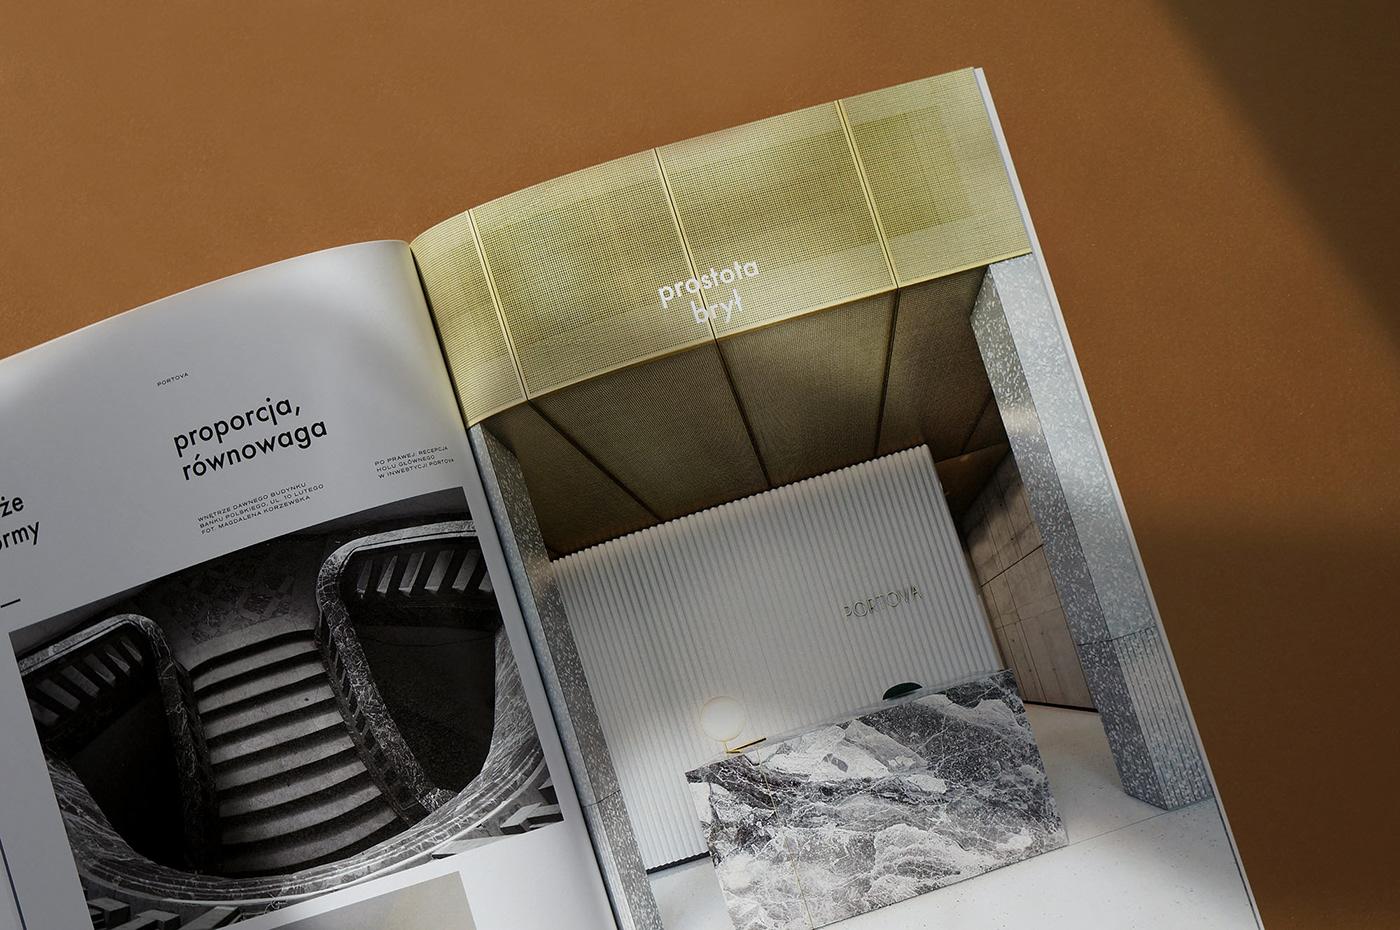 modernism gdynia poland editorial minimal simplicity wedzicka Catalogue editorialdesign Minimalism